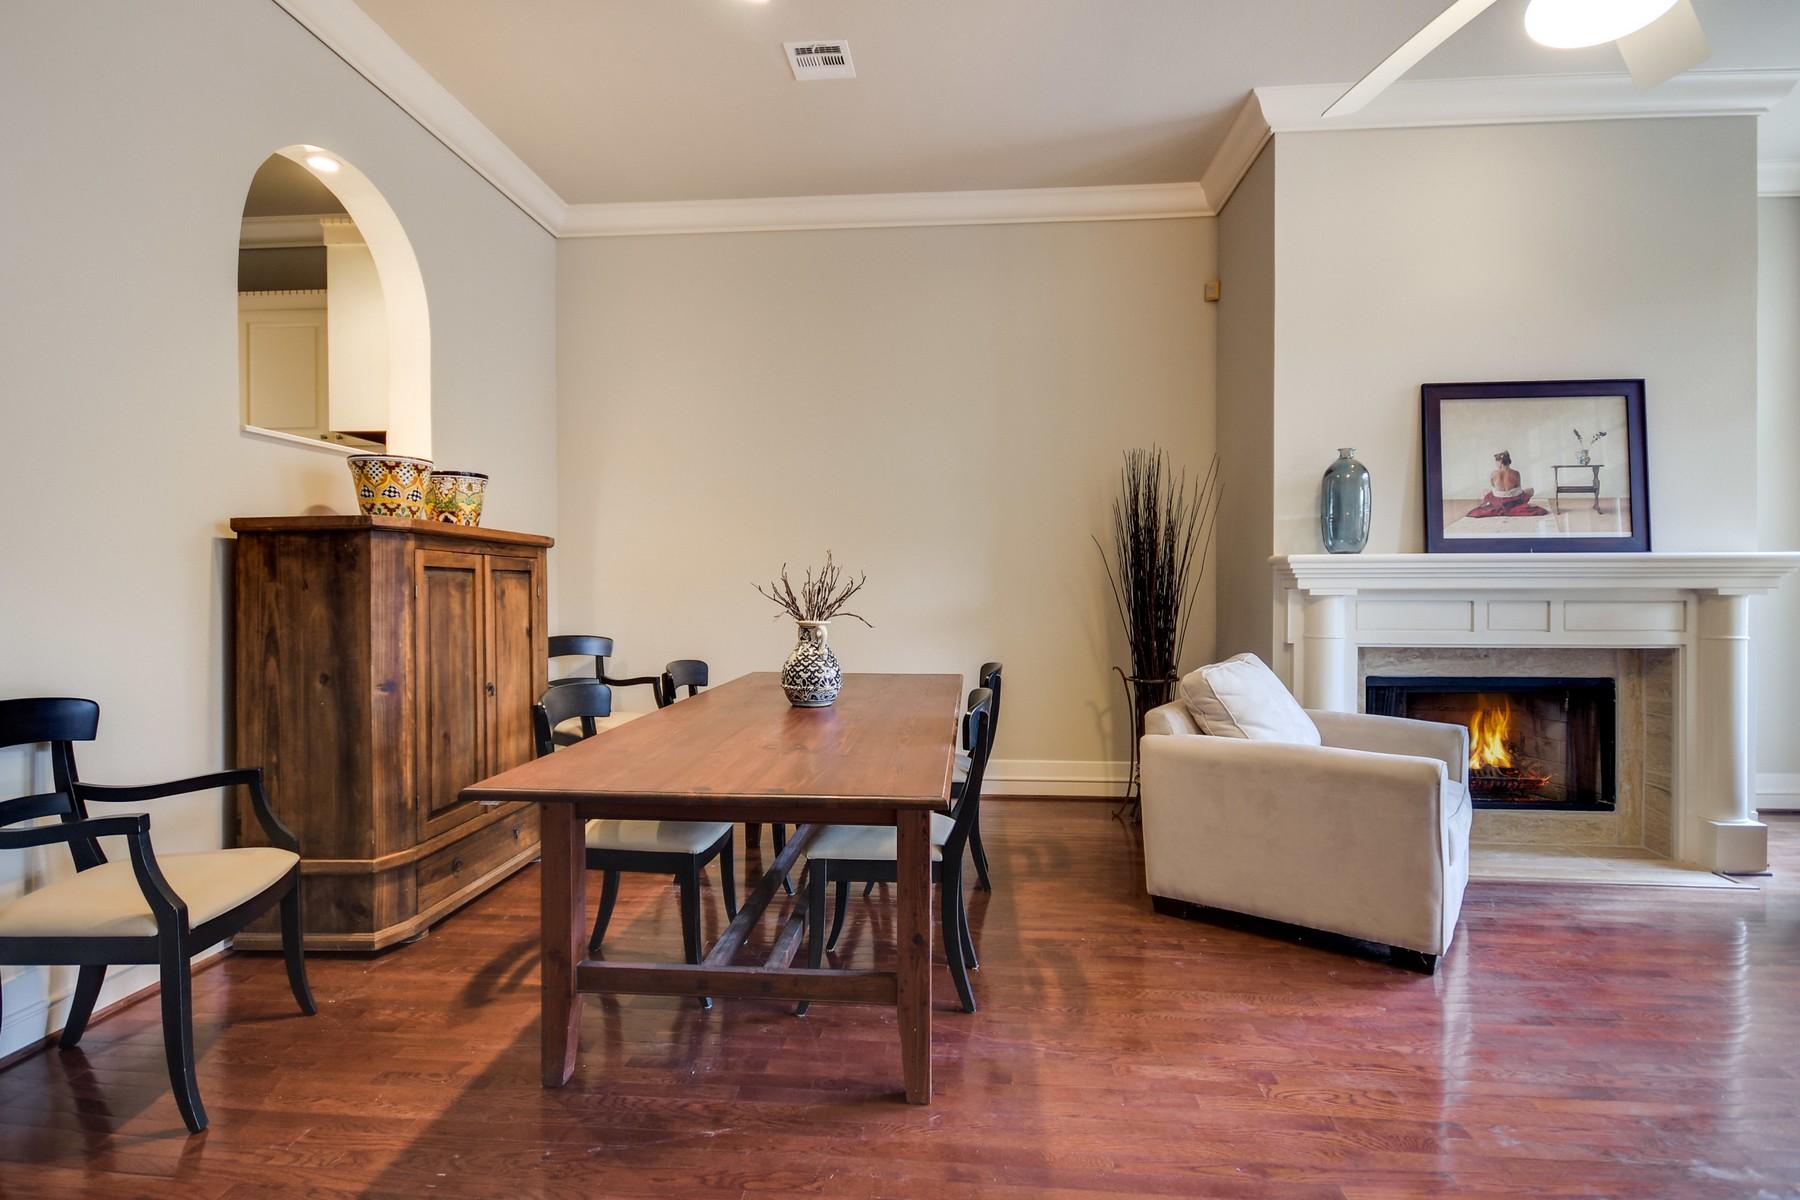 Condominium for Sale at Sophisticated Three Level St Tropez Condo 1937 Rue De St Tropez 14 Austin, Texas 78746 United States